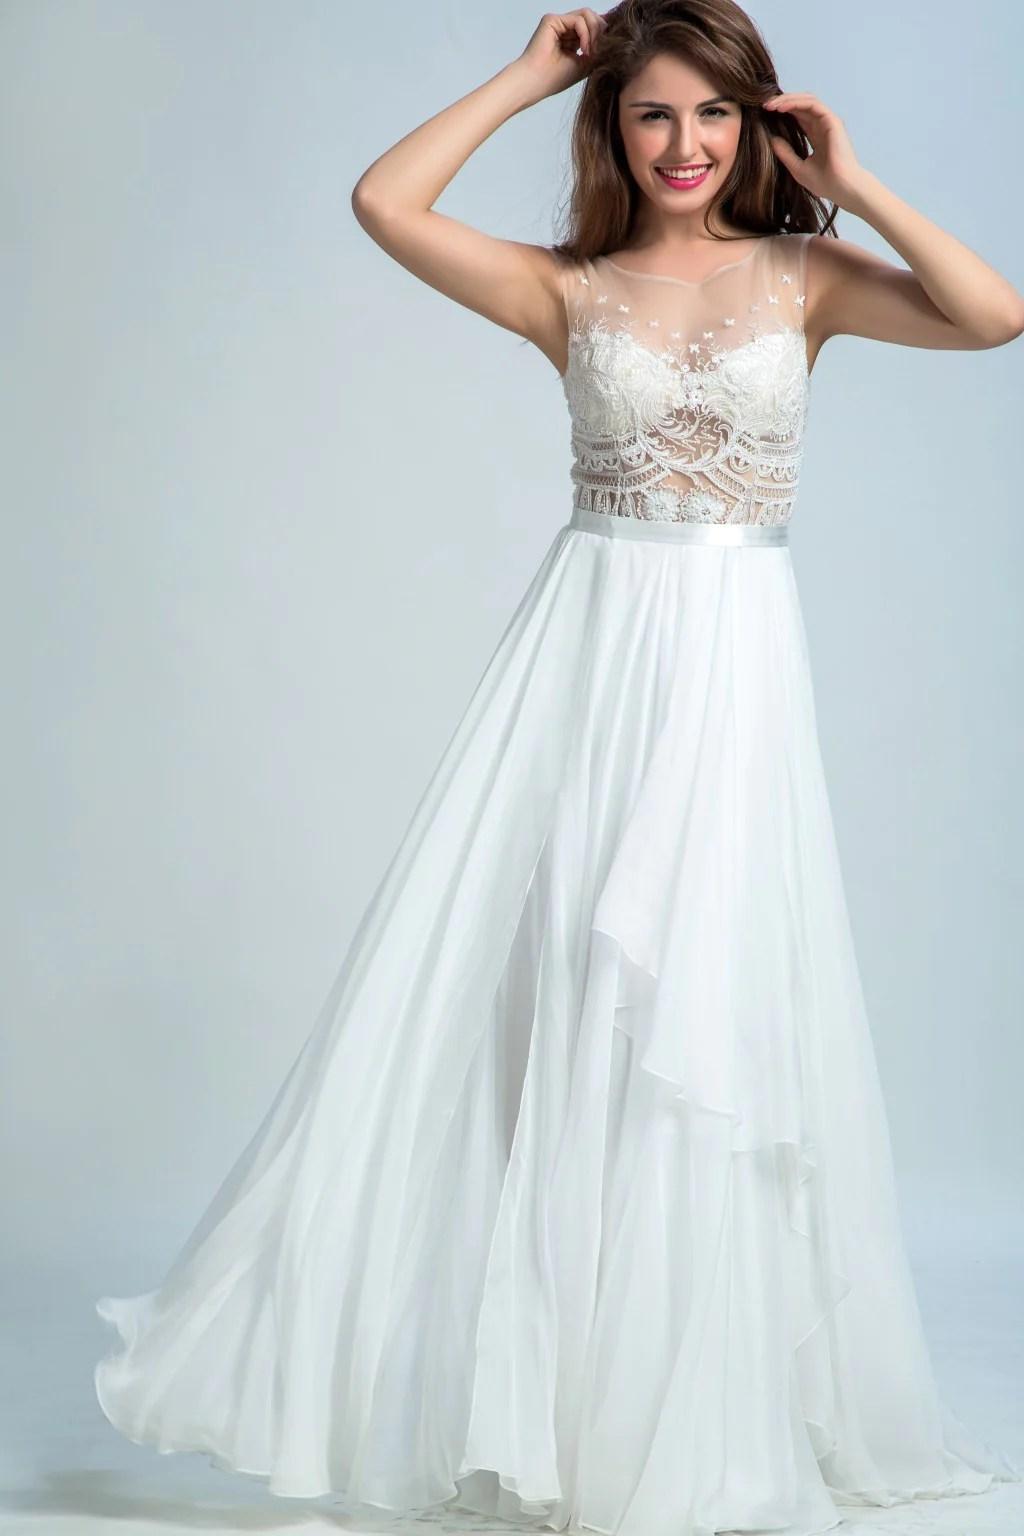 Long White Prom Dresses